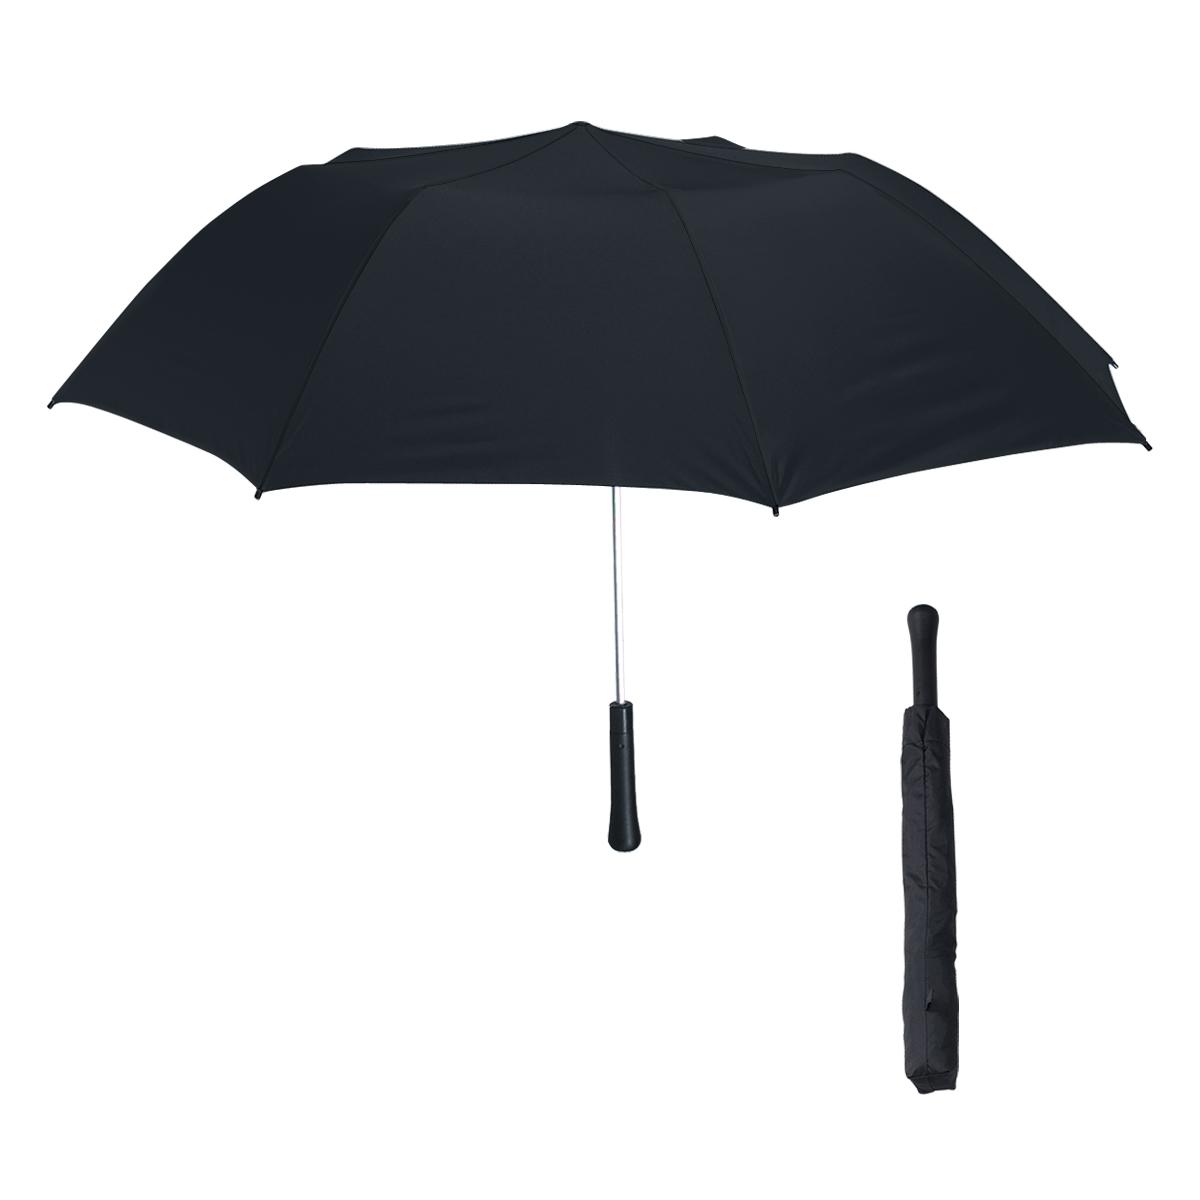 4030 - Paraguas automático grande